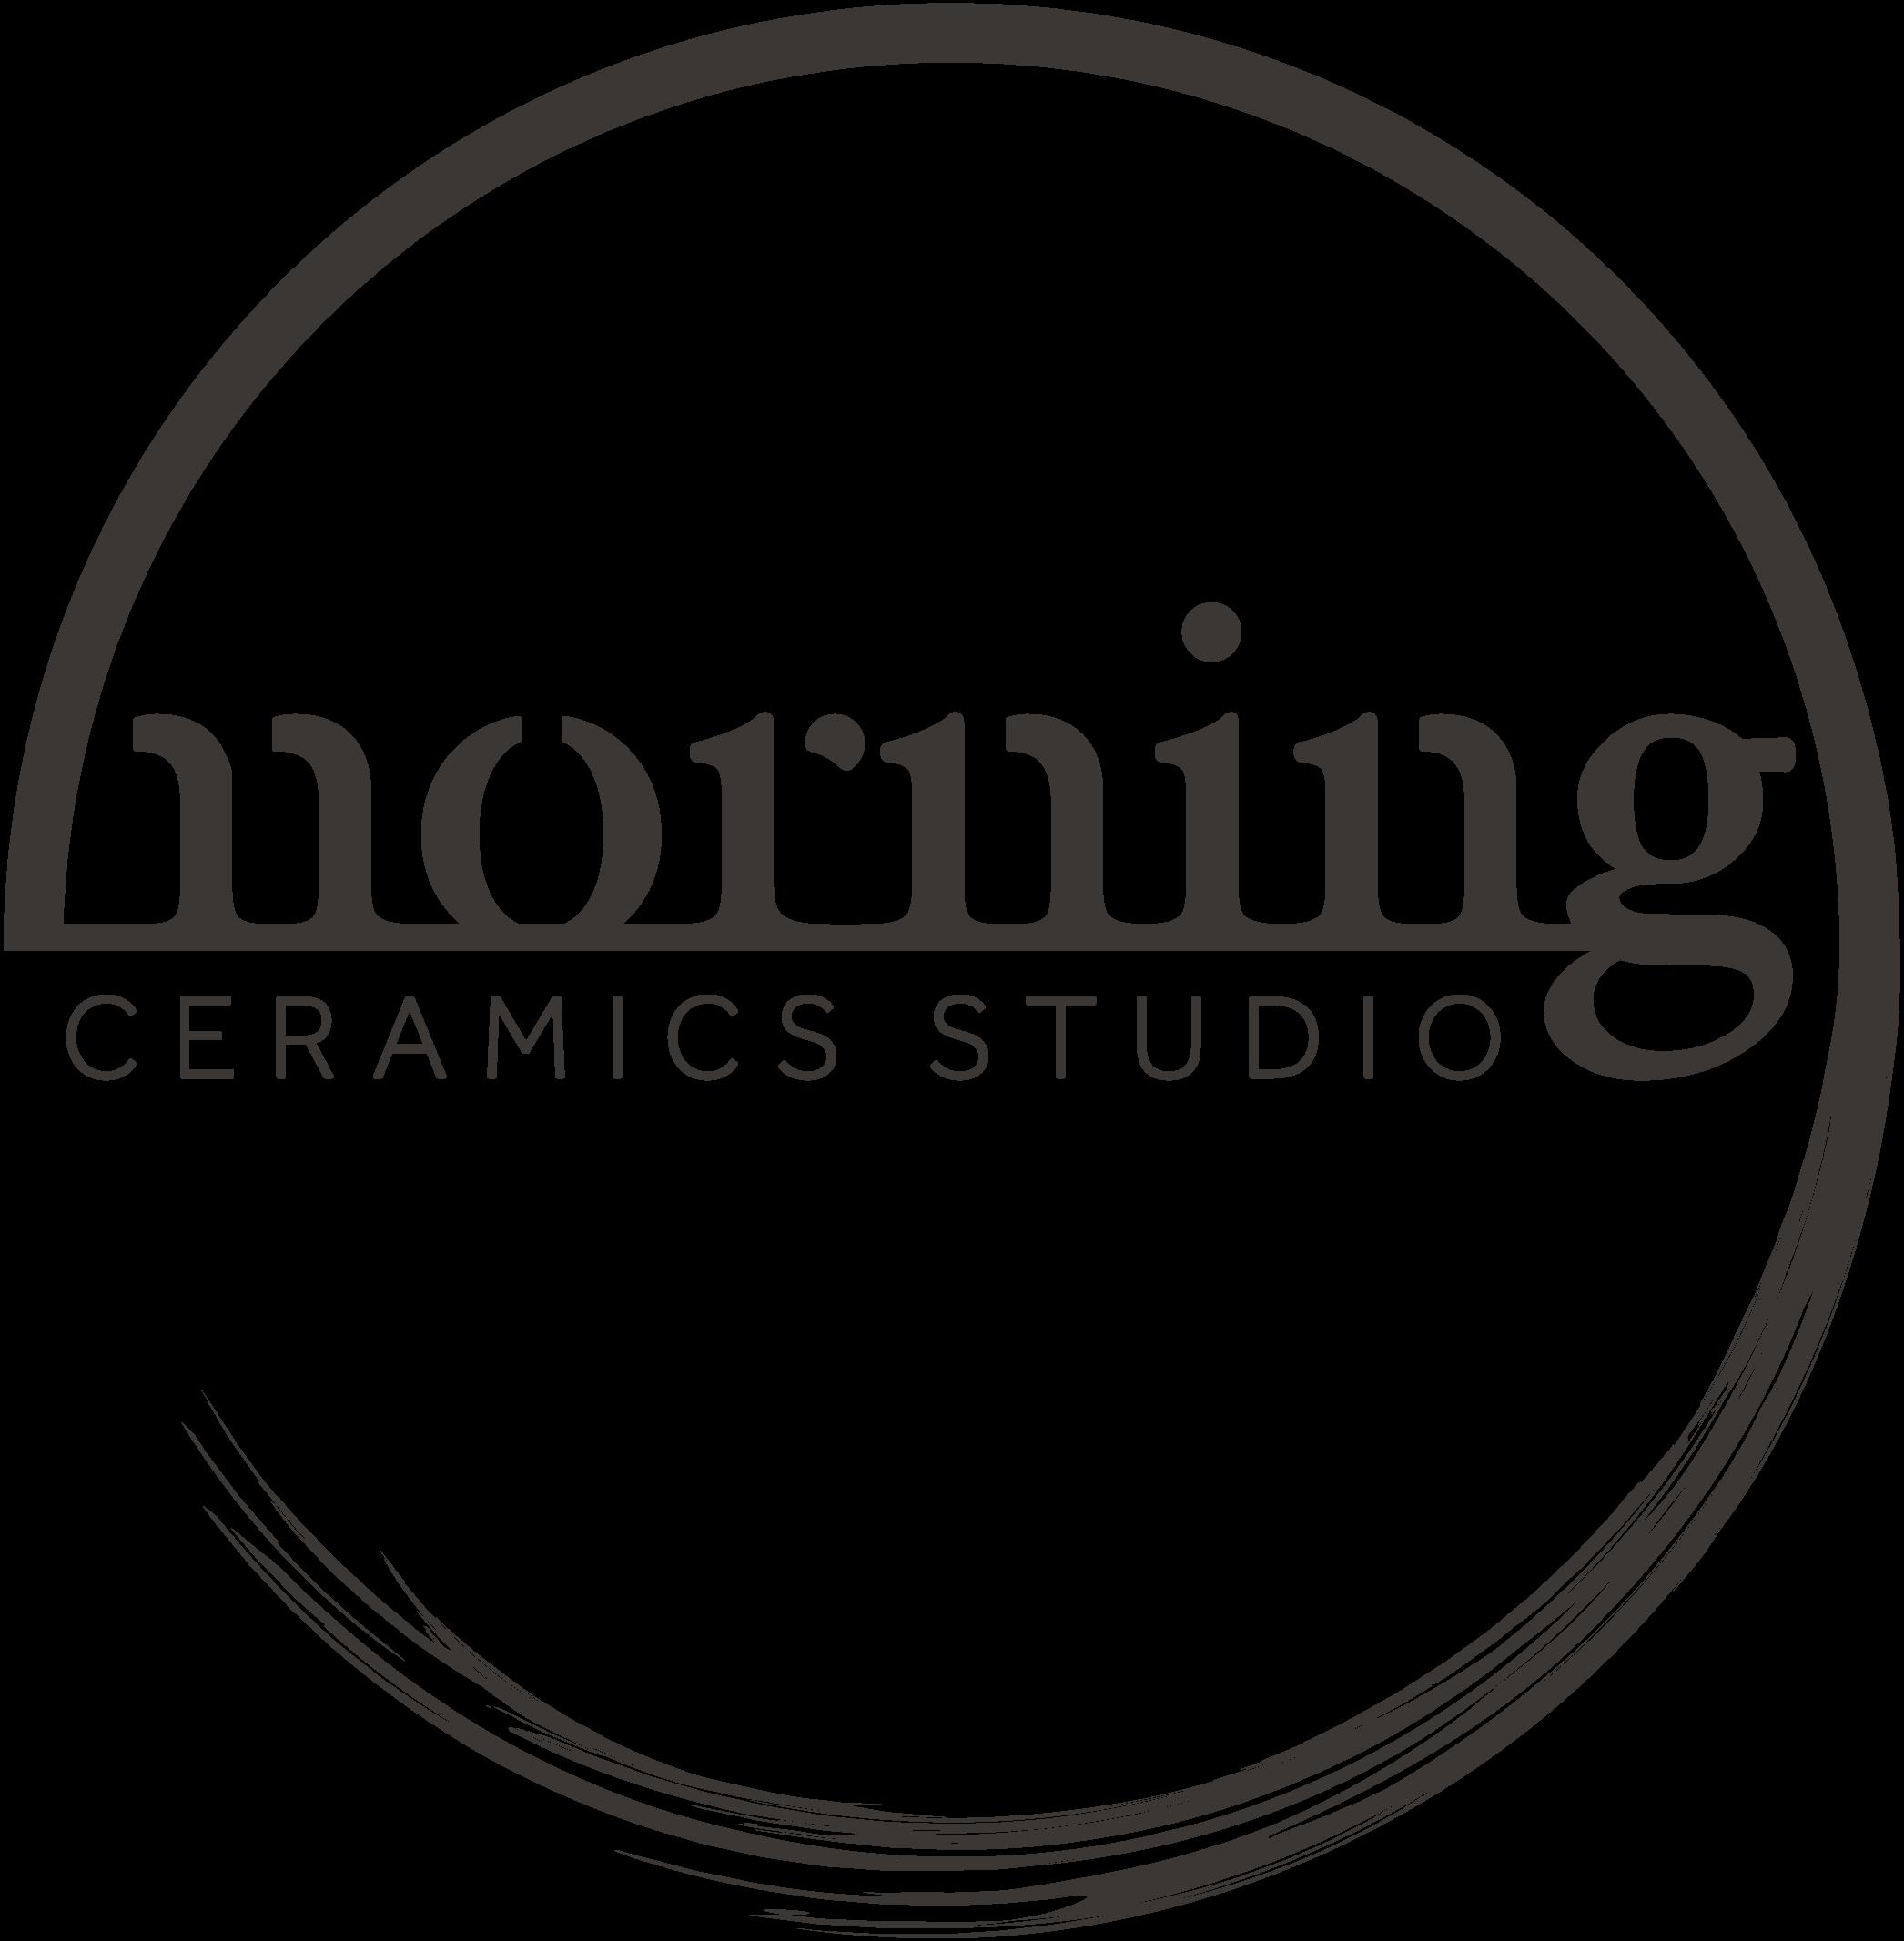 Morning Ceramics_Logo.png